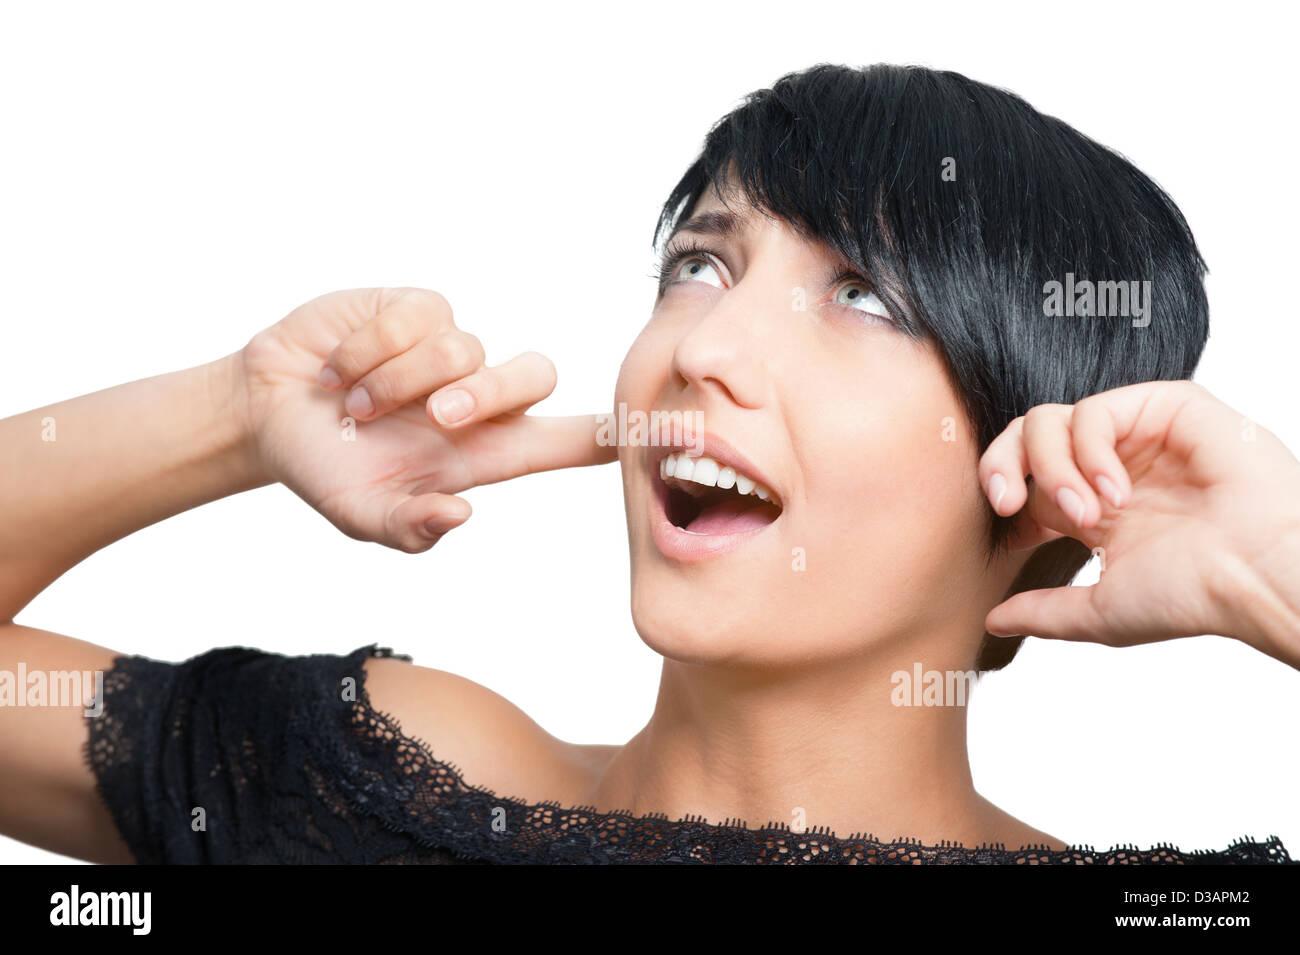 Noise - Stock Image